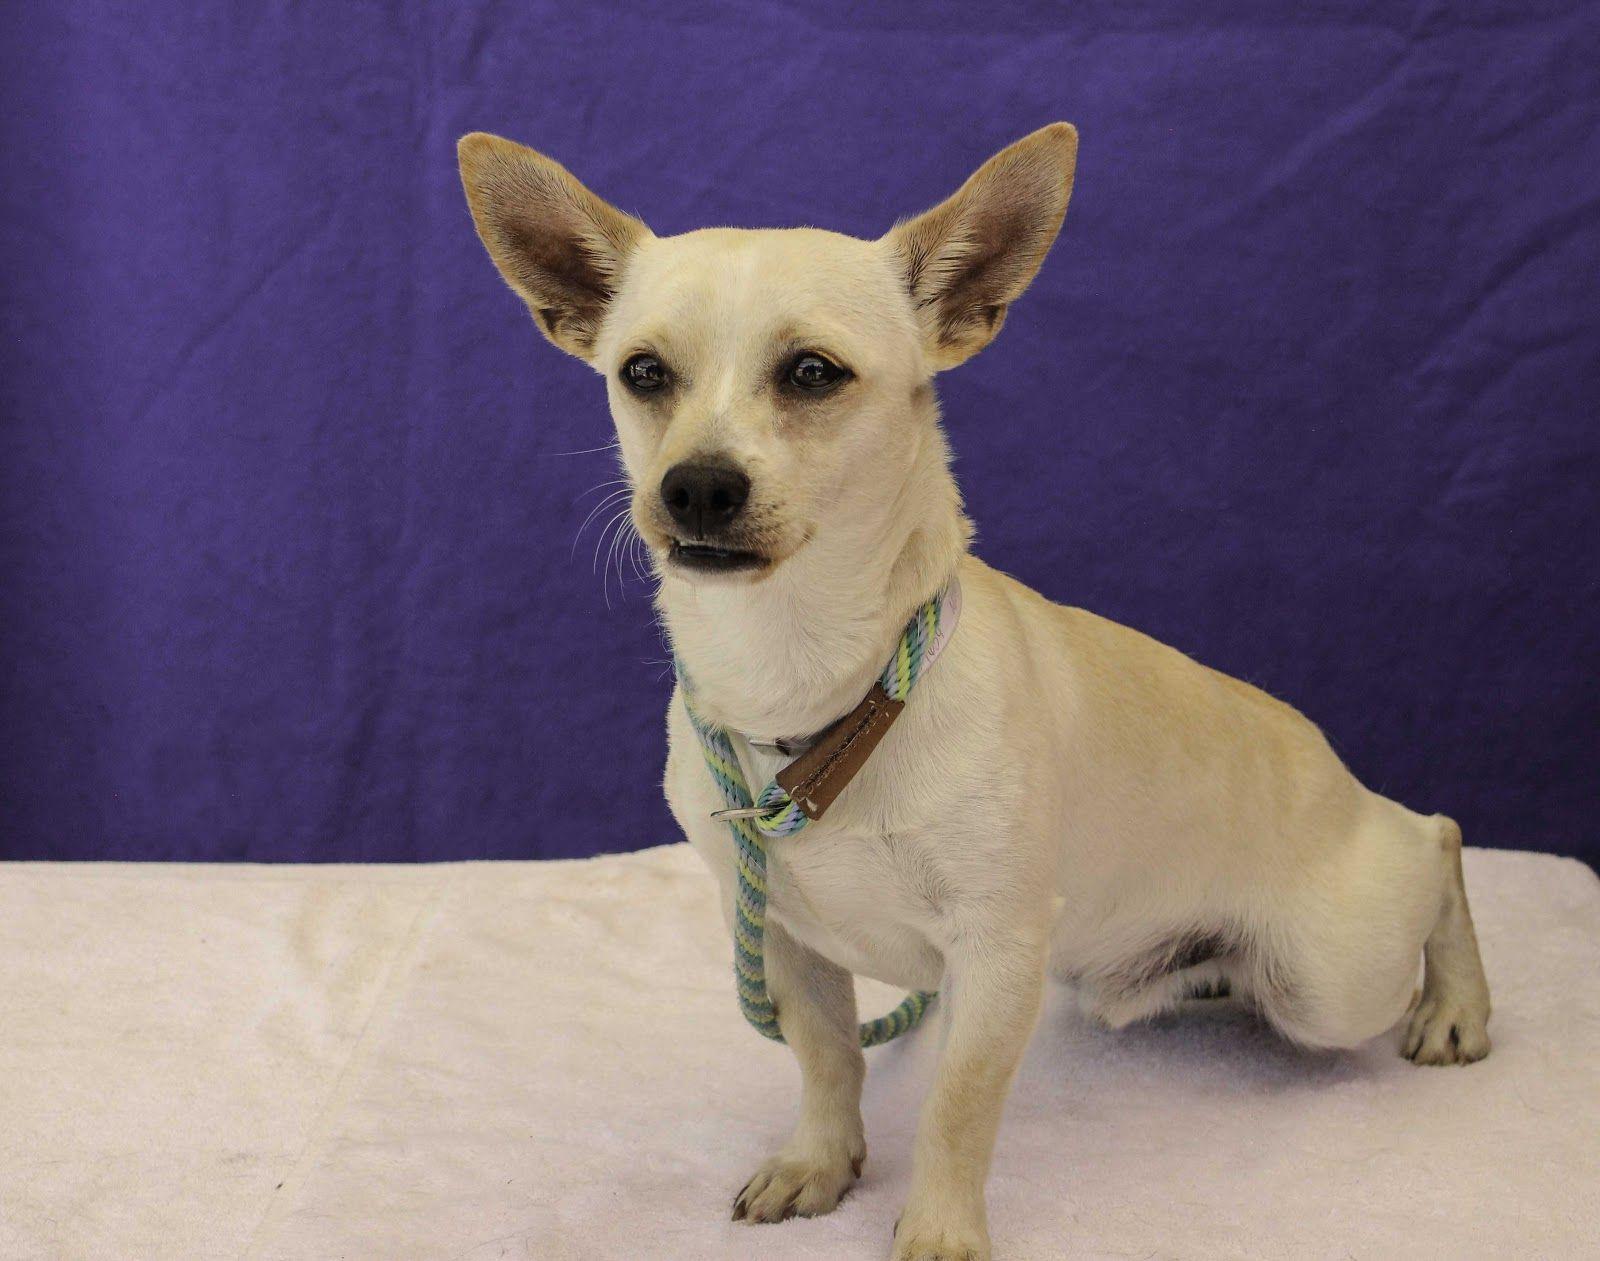 Chiweenie dog for Adoption in Pasadena, CA. ADN605443 on